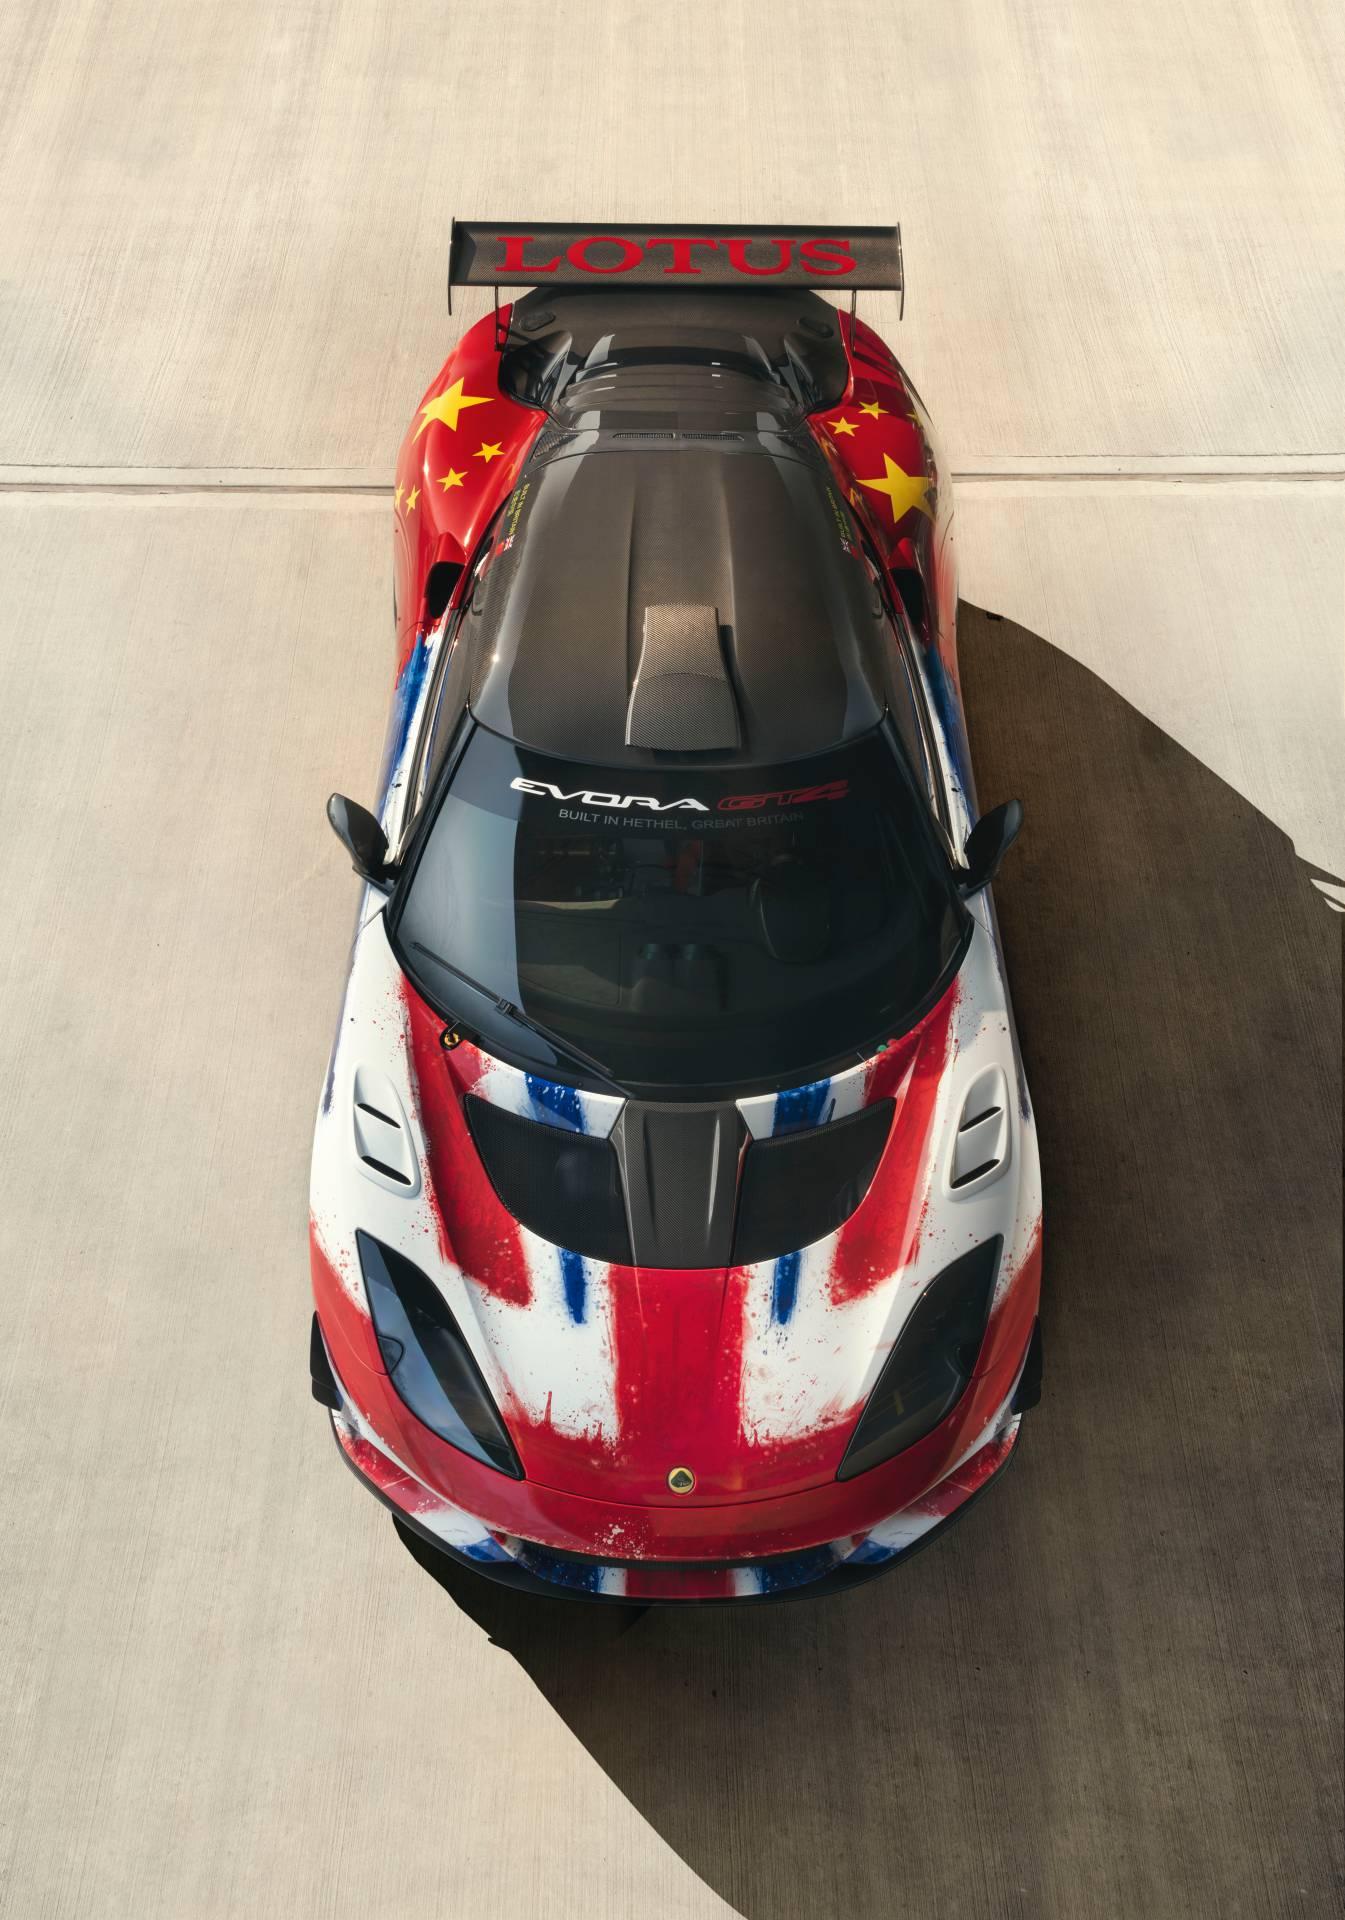 Lotus-Evora-GT4-Concept-10